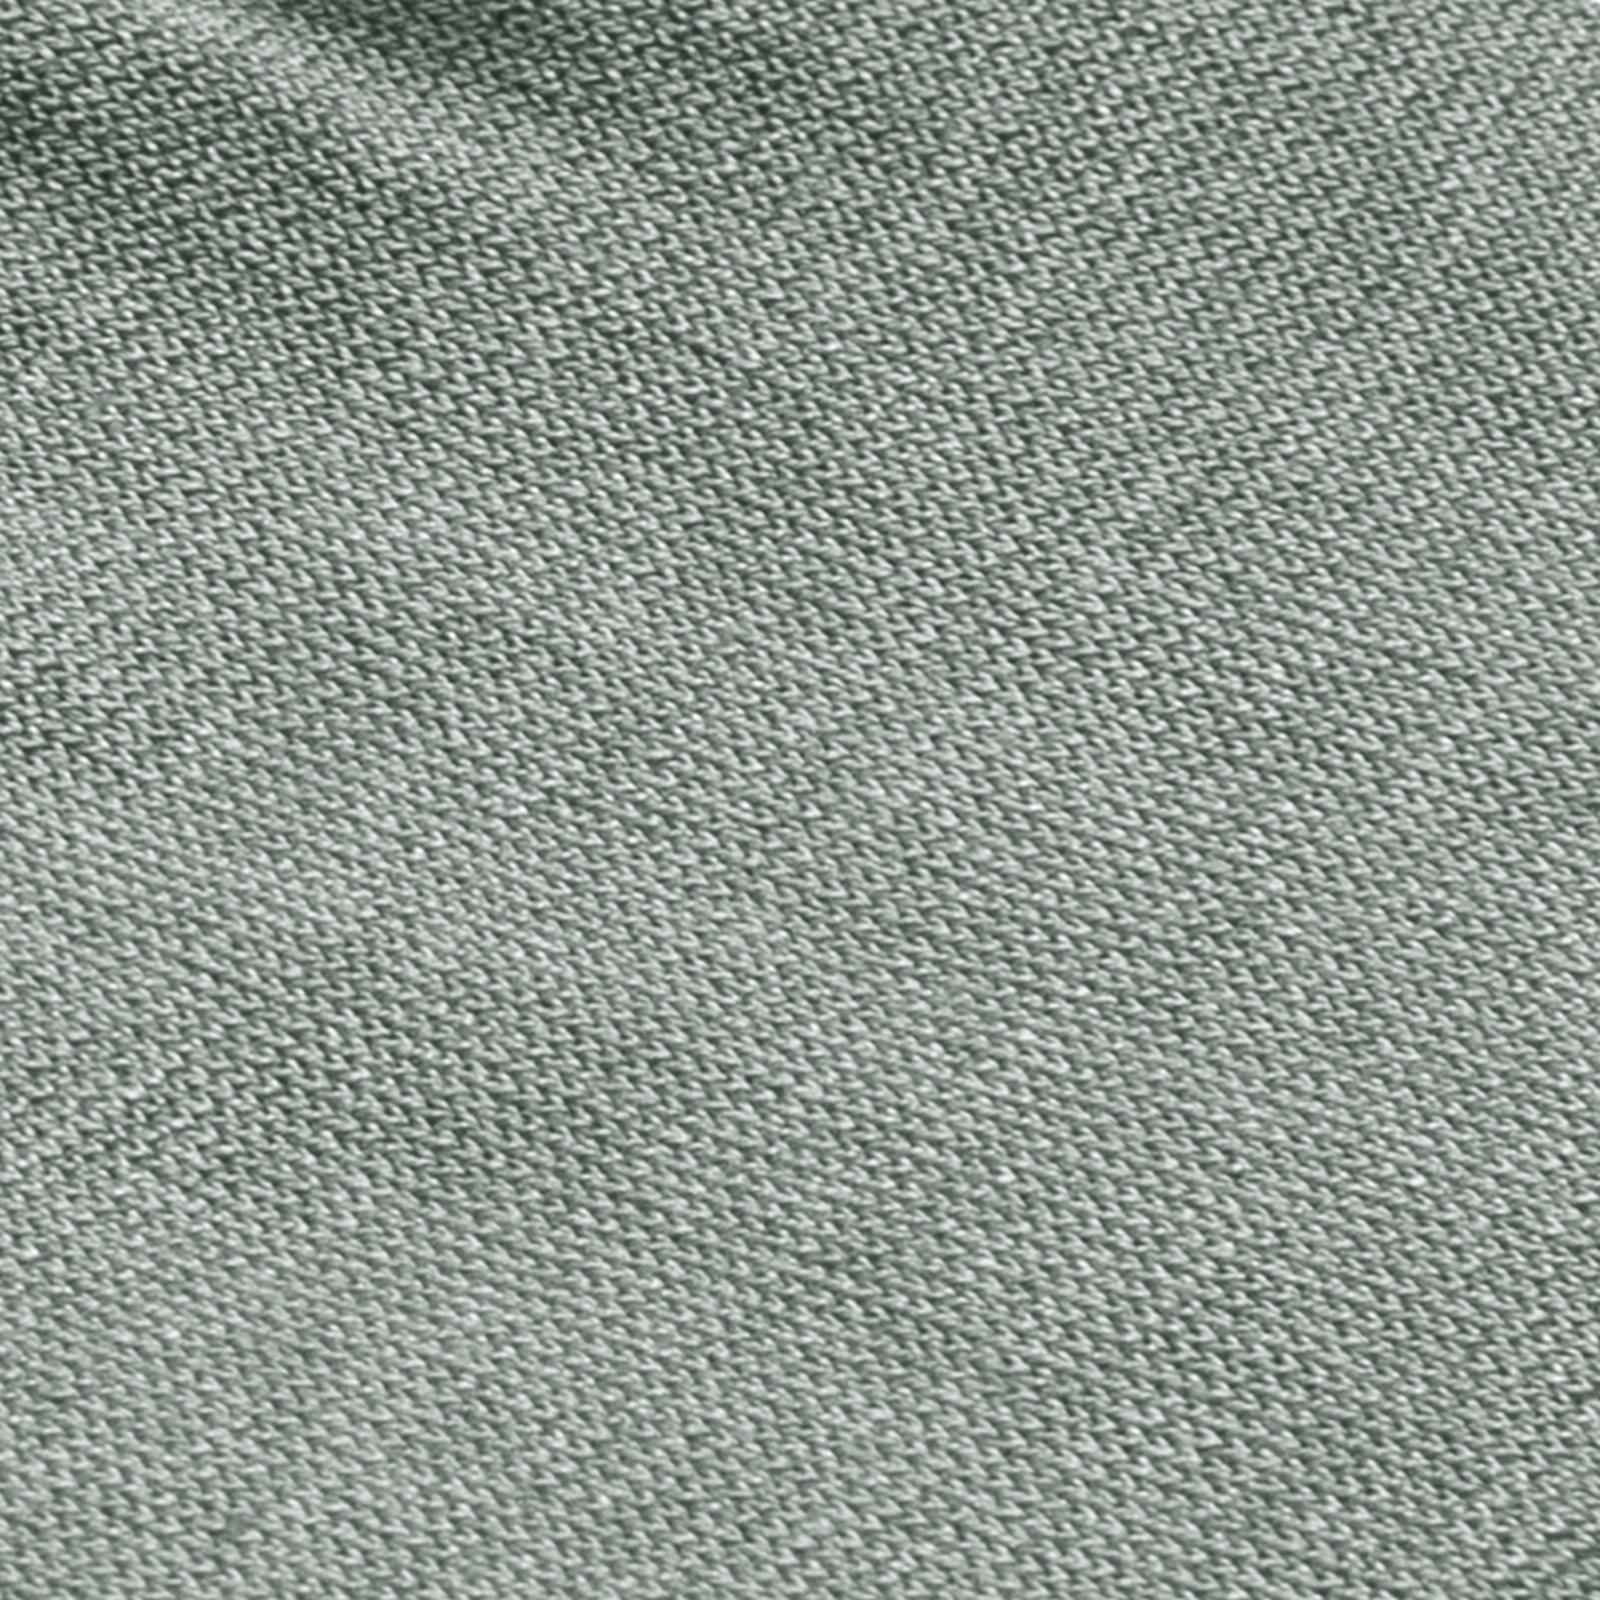 Carlo Lanza Green/grey cotton socks